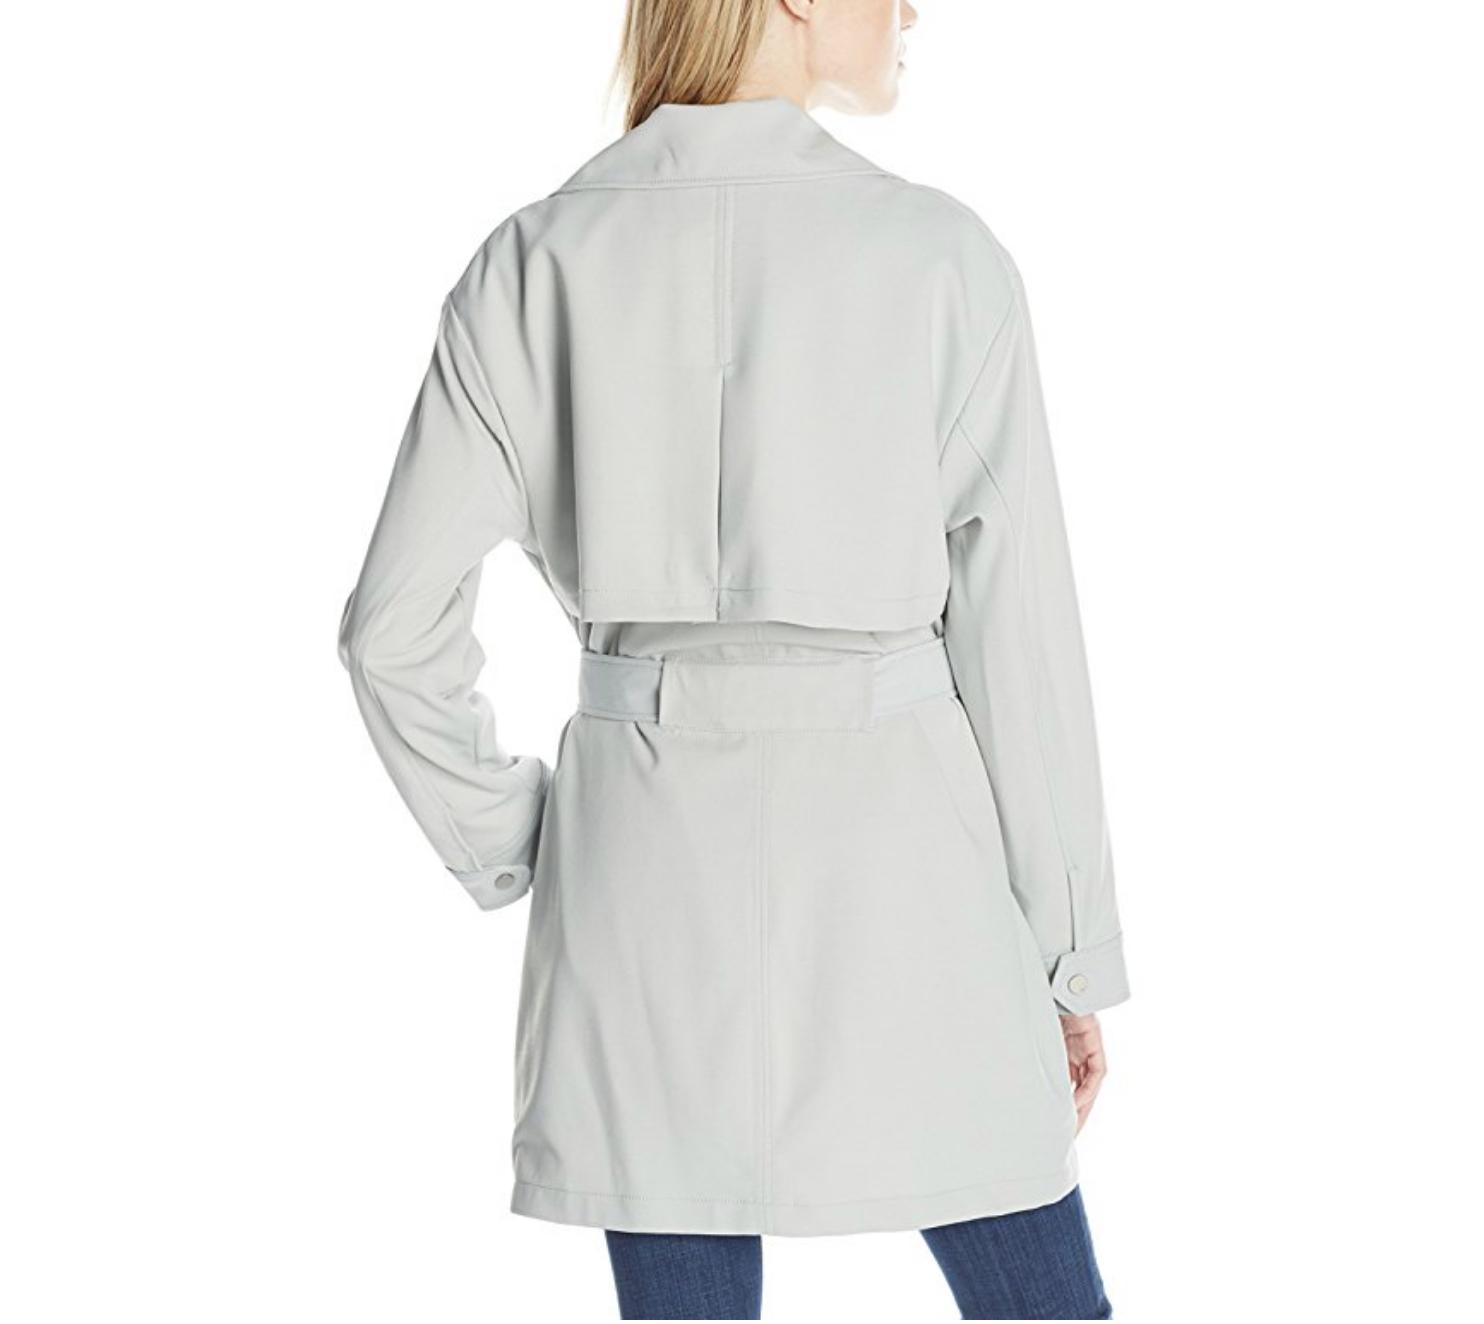 7 7 7 For All Mankind Women's Asymmetrical Fashion Drape Trench Coat, Coastal Grey ace56f